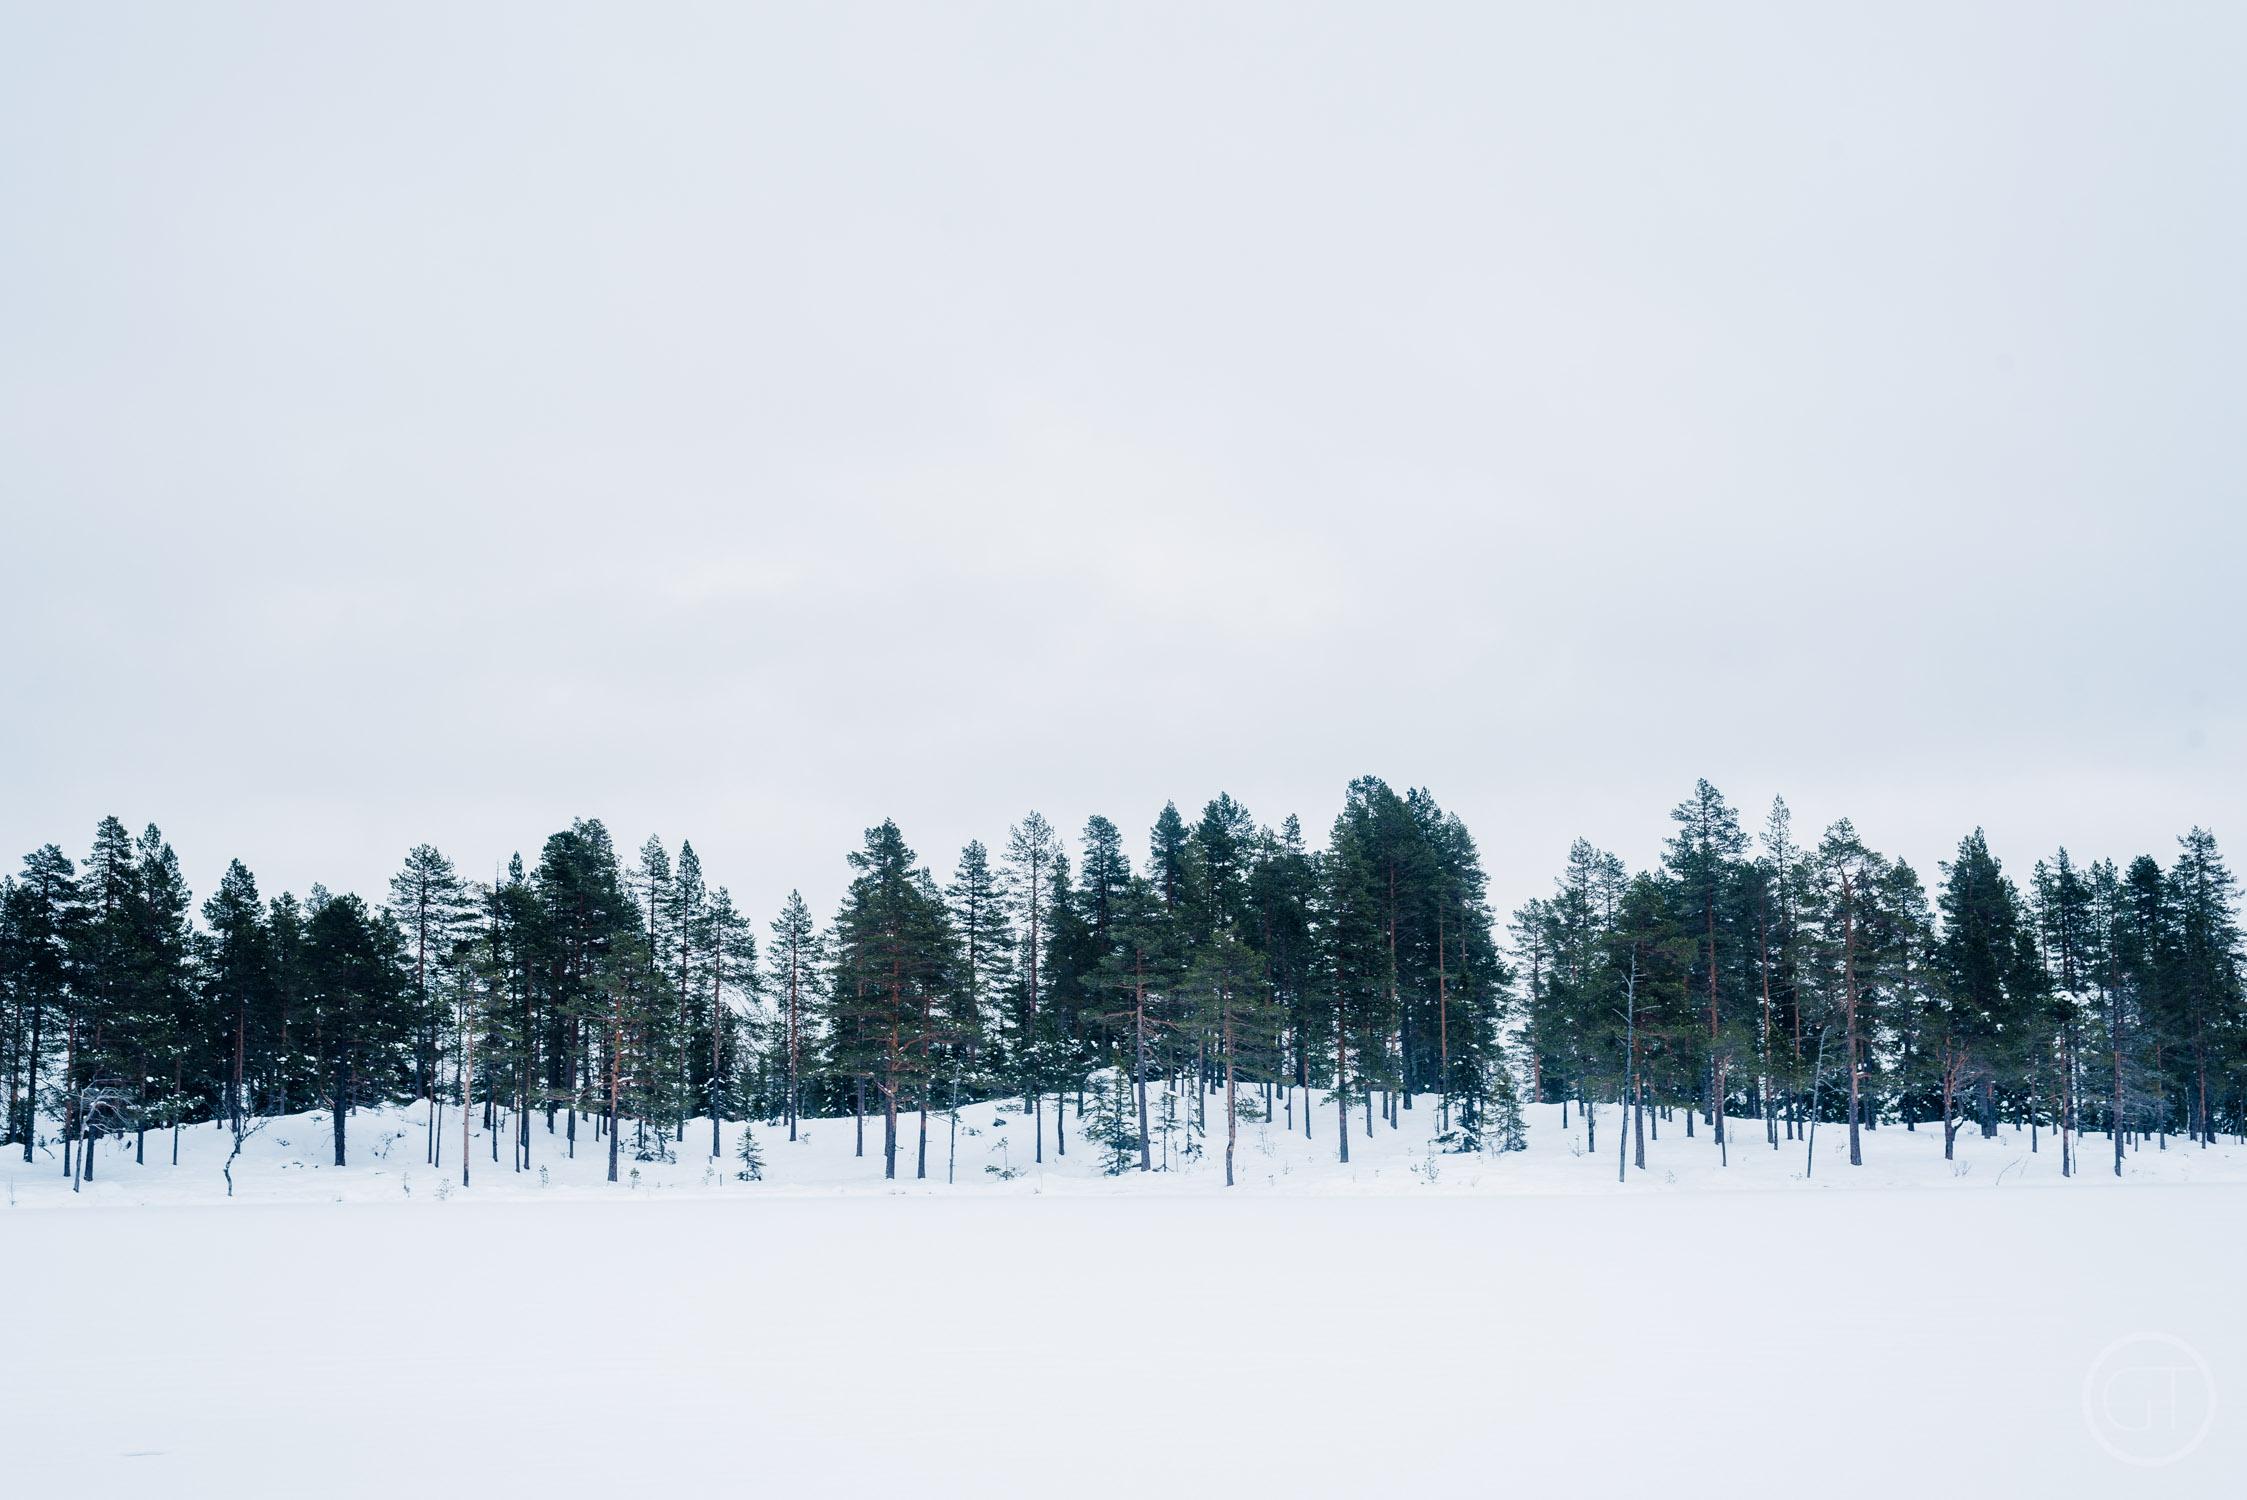 GUSTAV_THUESEN_HUNTING_NORWAY_OUTDOOR_LIFESTYLE_PHOTOGRAPHER_PROFESSIONAL-28.jpg